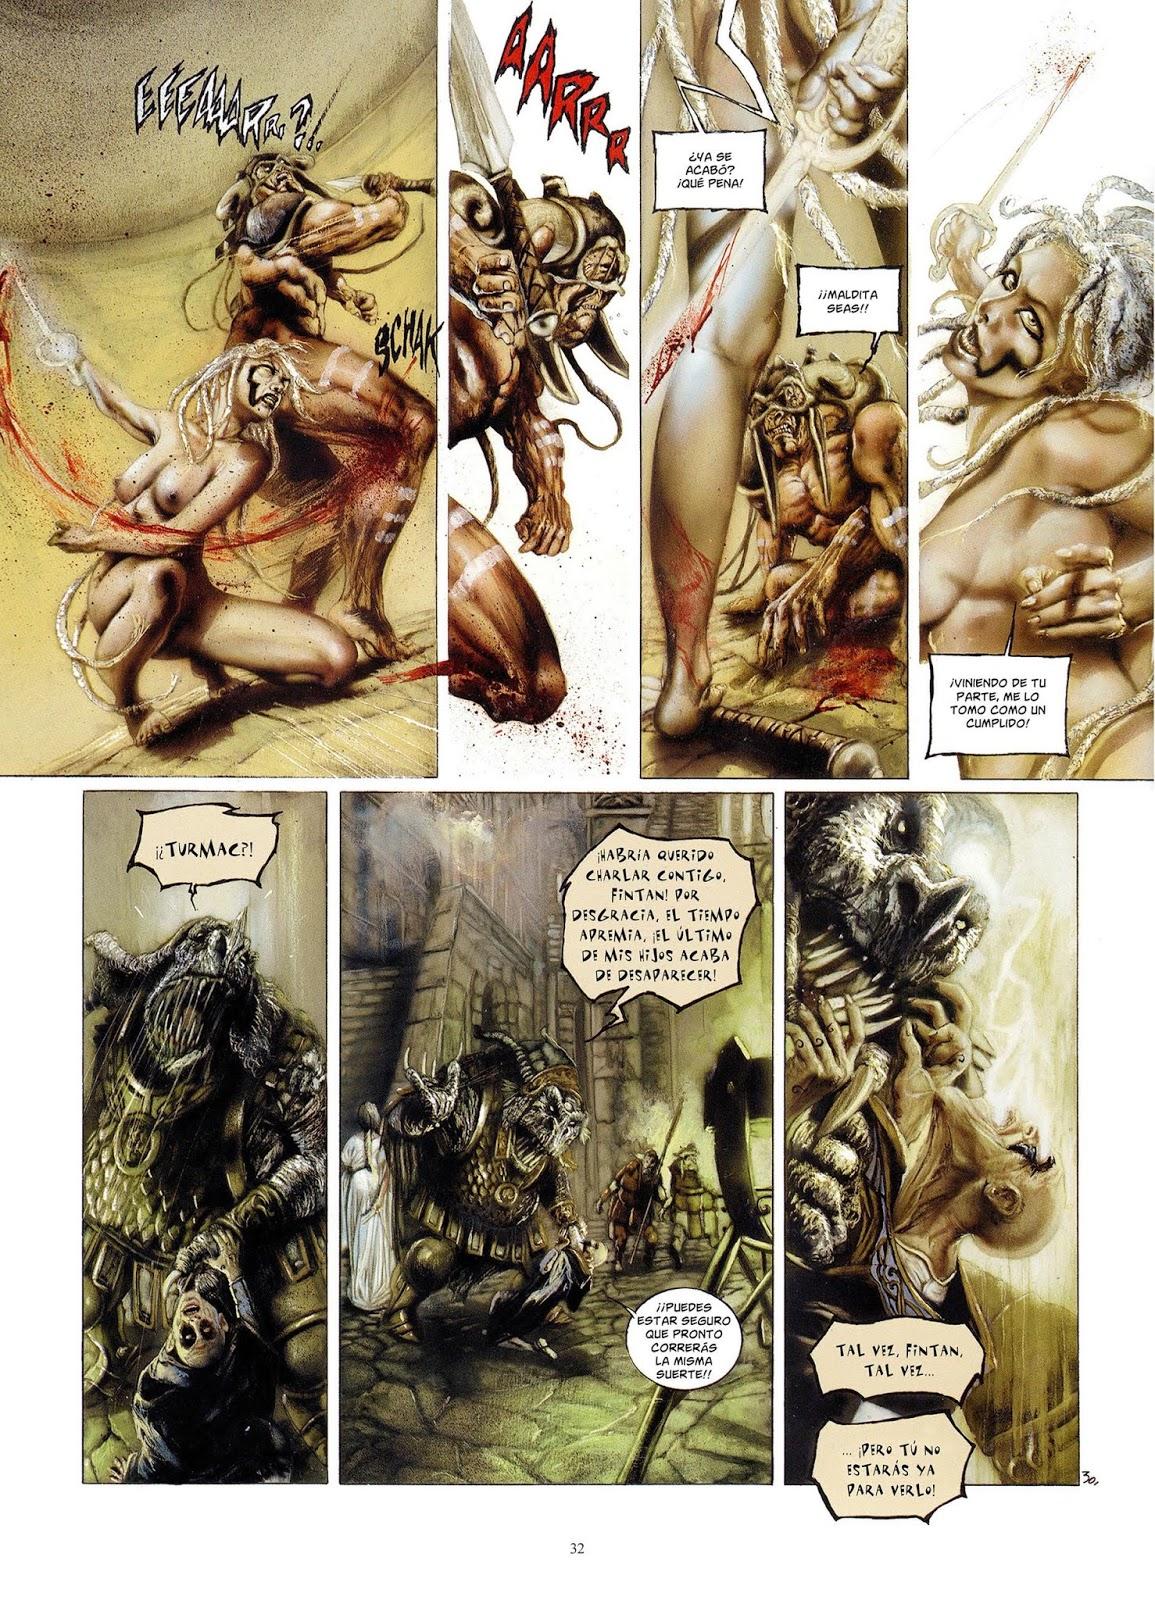 ComicAlt: Korrigans